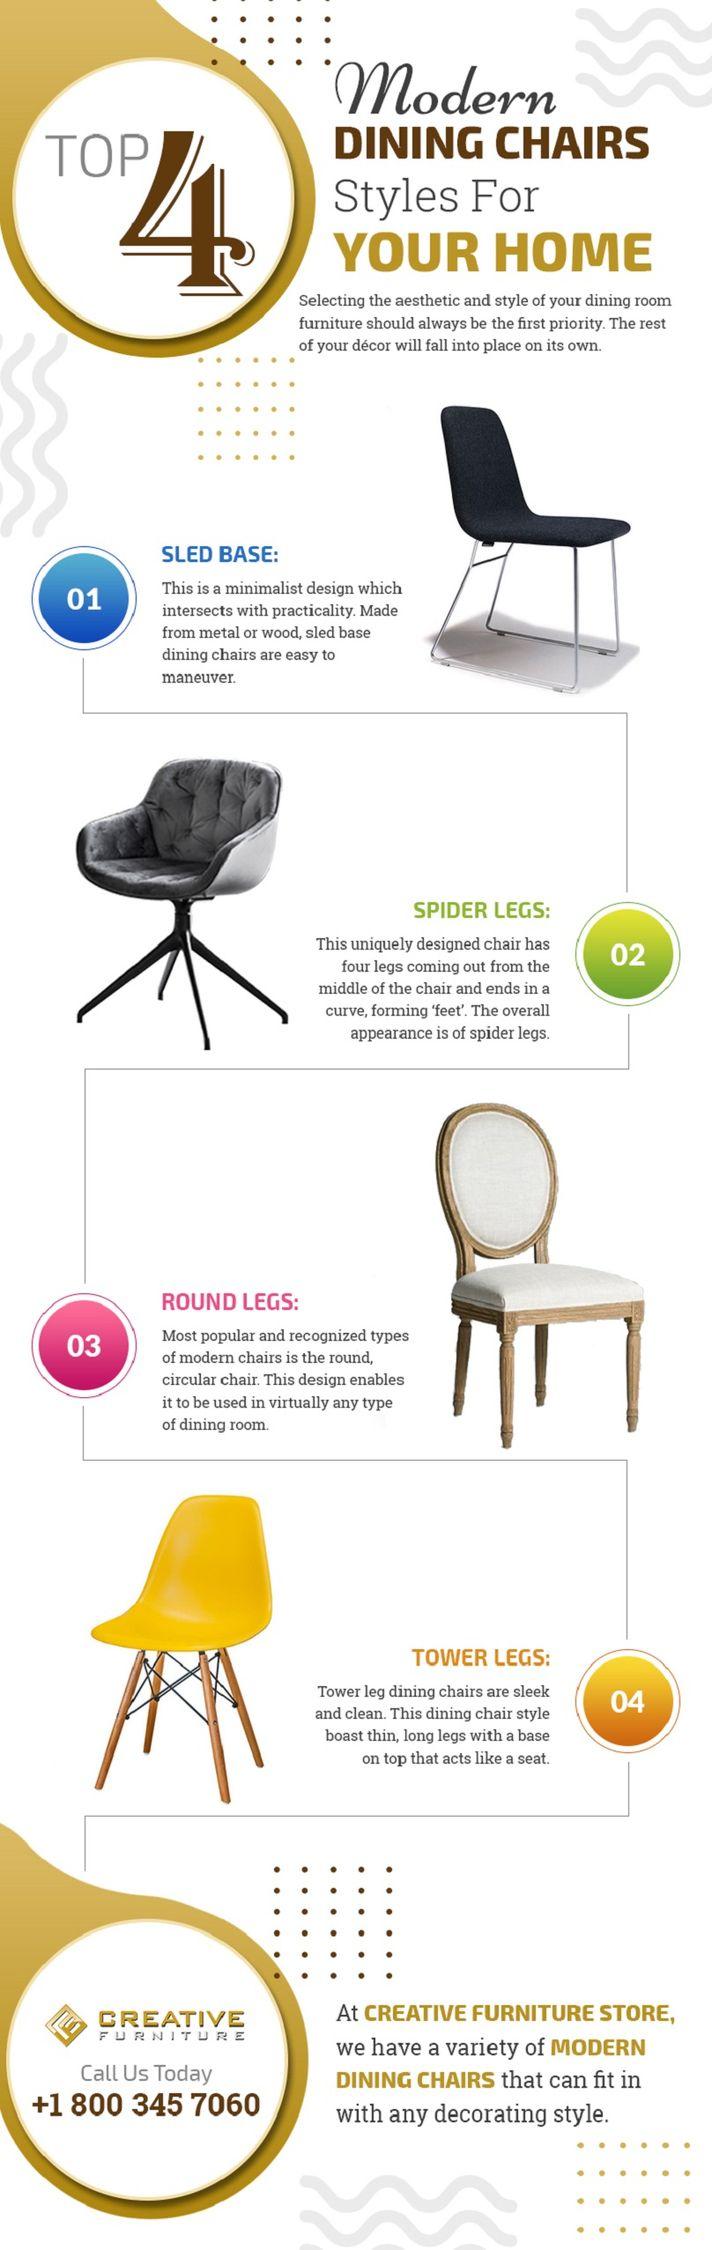 Top 4 Modern Dining Chairs Styl - creativefurniturestore | ello